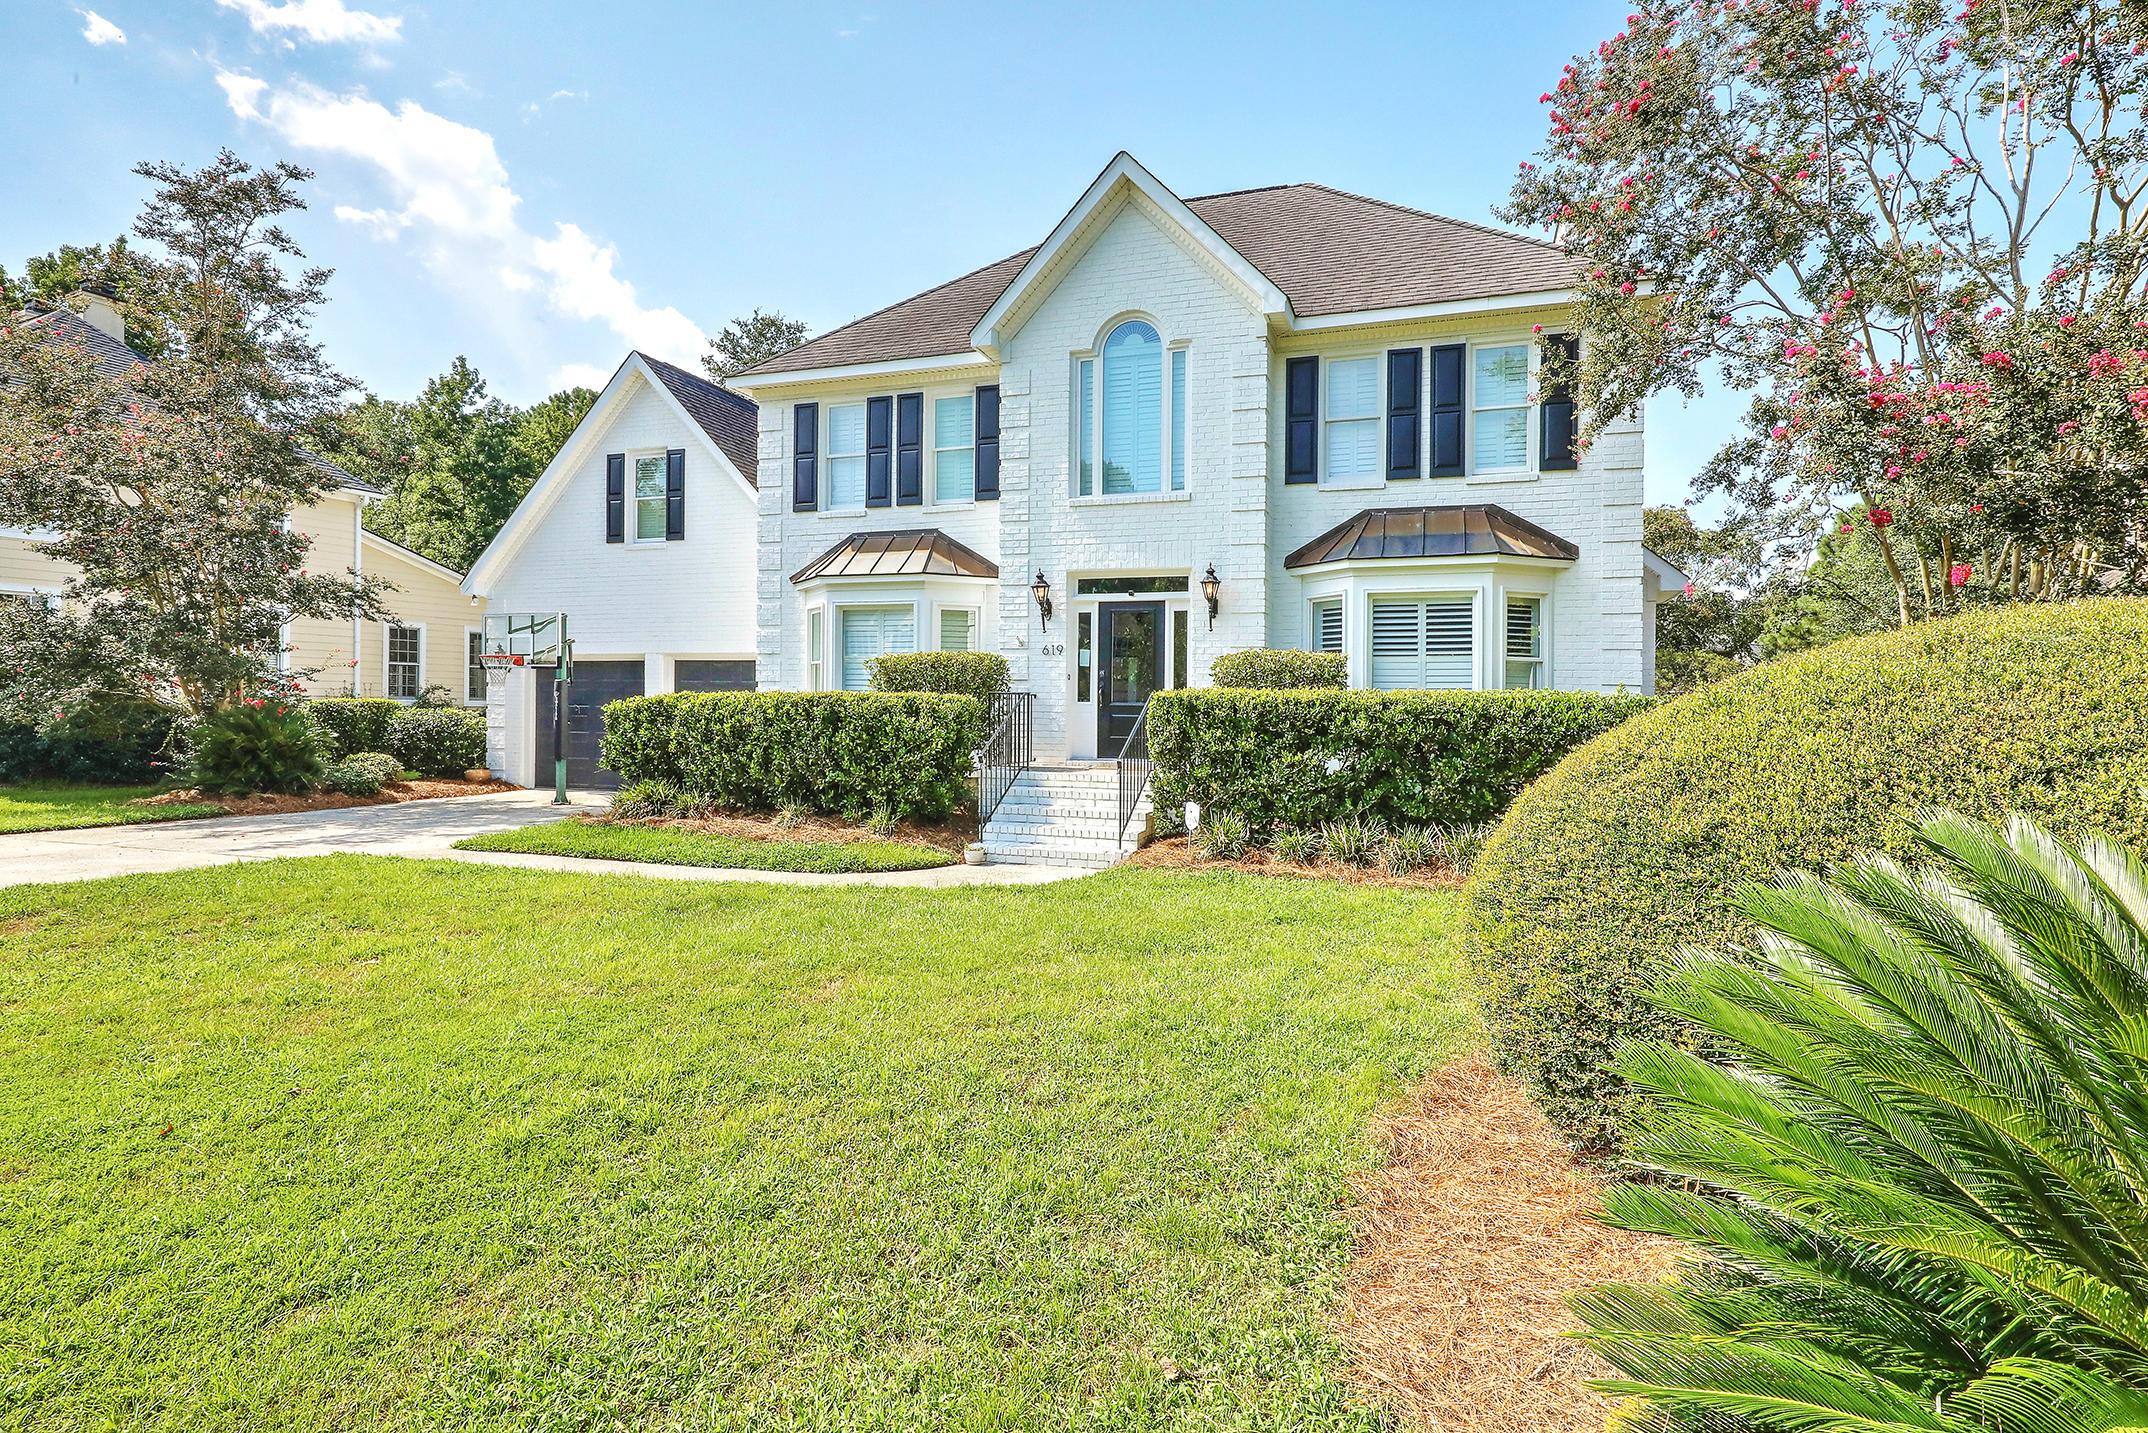 Hobcaw Creek Plantation Homes For Sale - 619 Palisades, Mount Pleasant, SC - 73